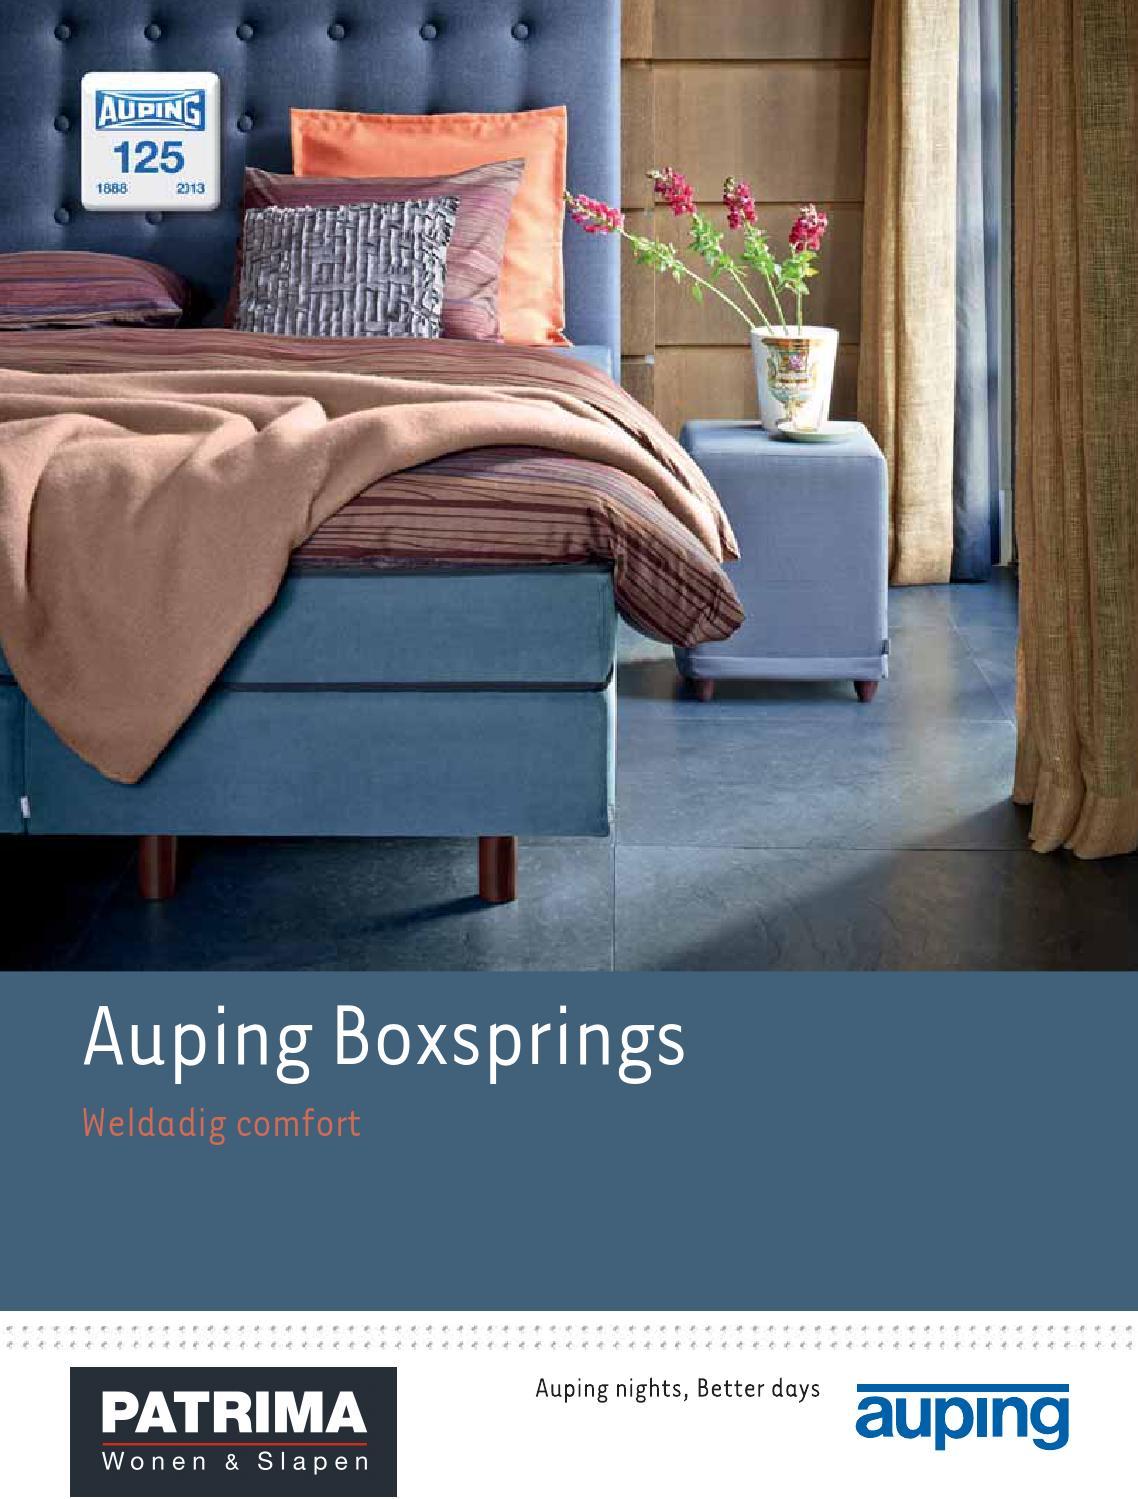 Auping Boxspring Boxton.Auping Boxsprings By Patrima Wonen Slapen Issuu